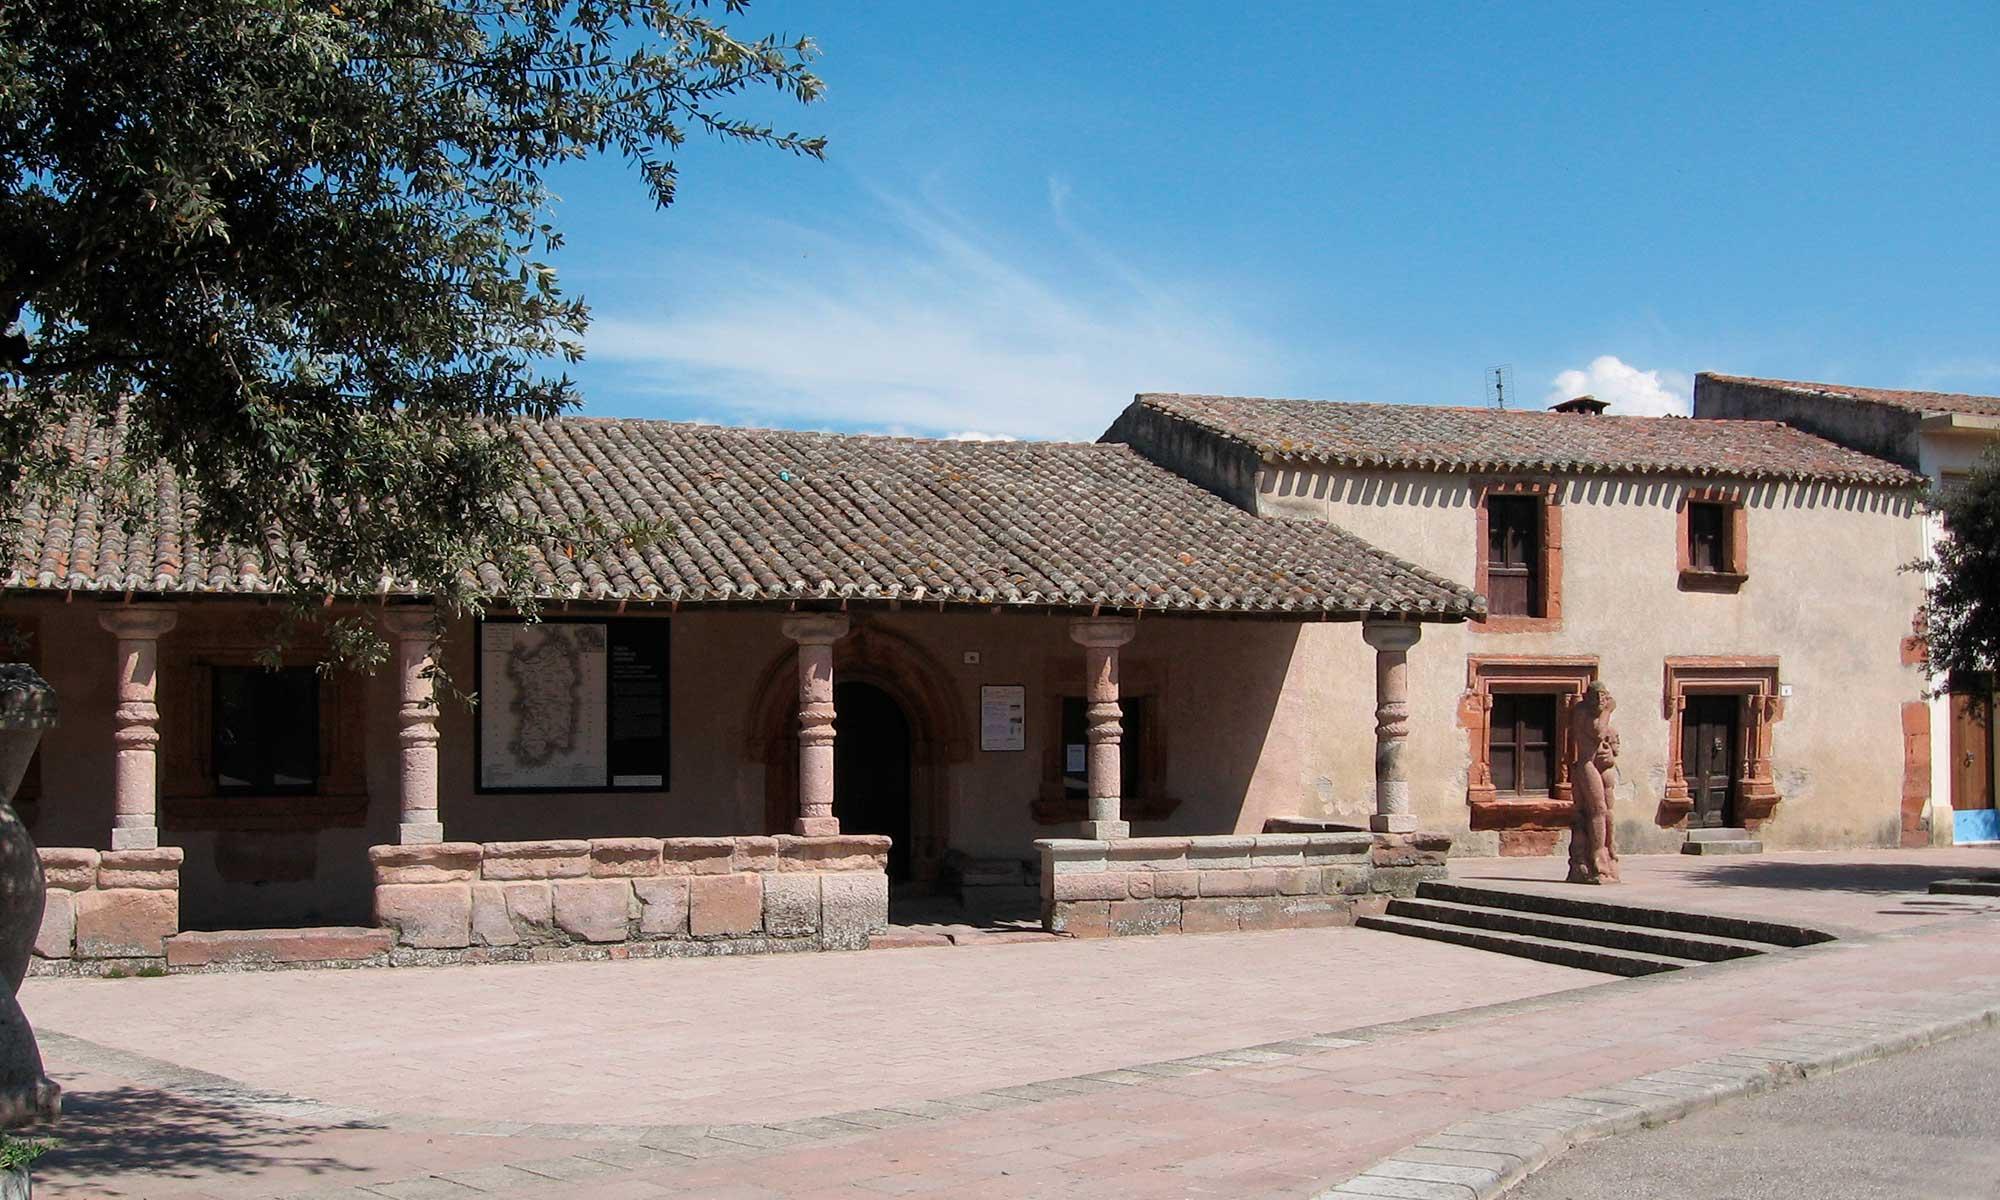 Casa Aragonese di Fordongianus